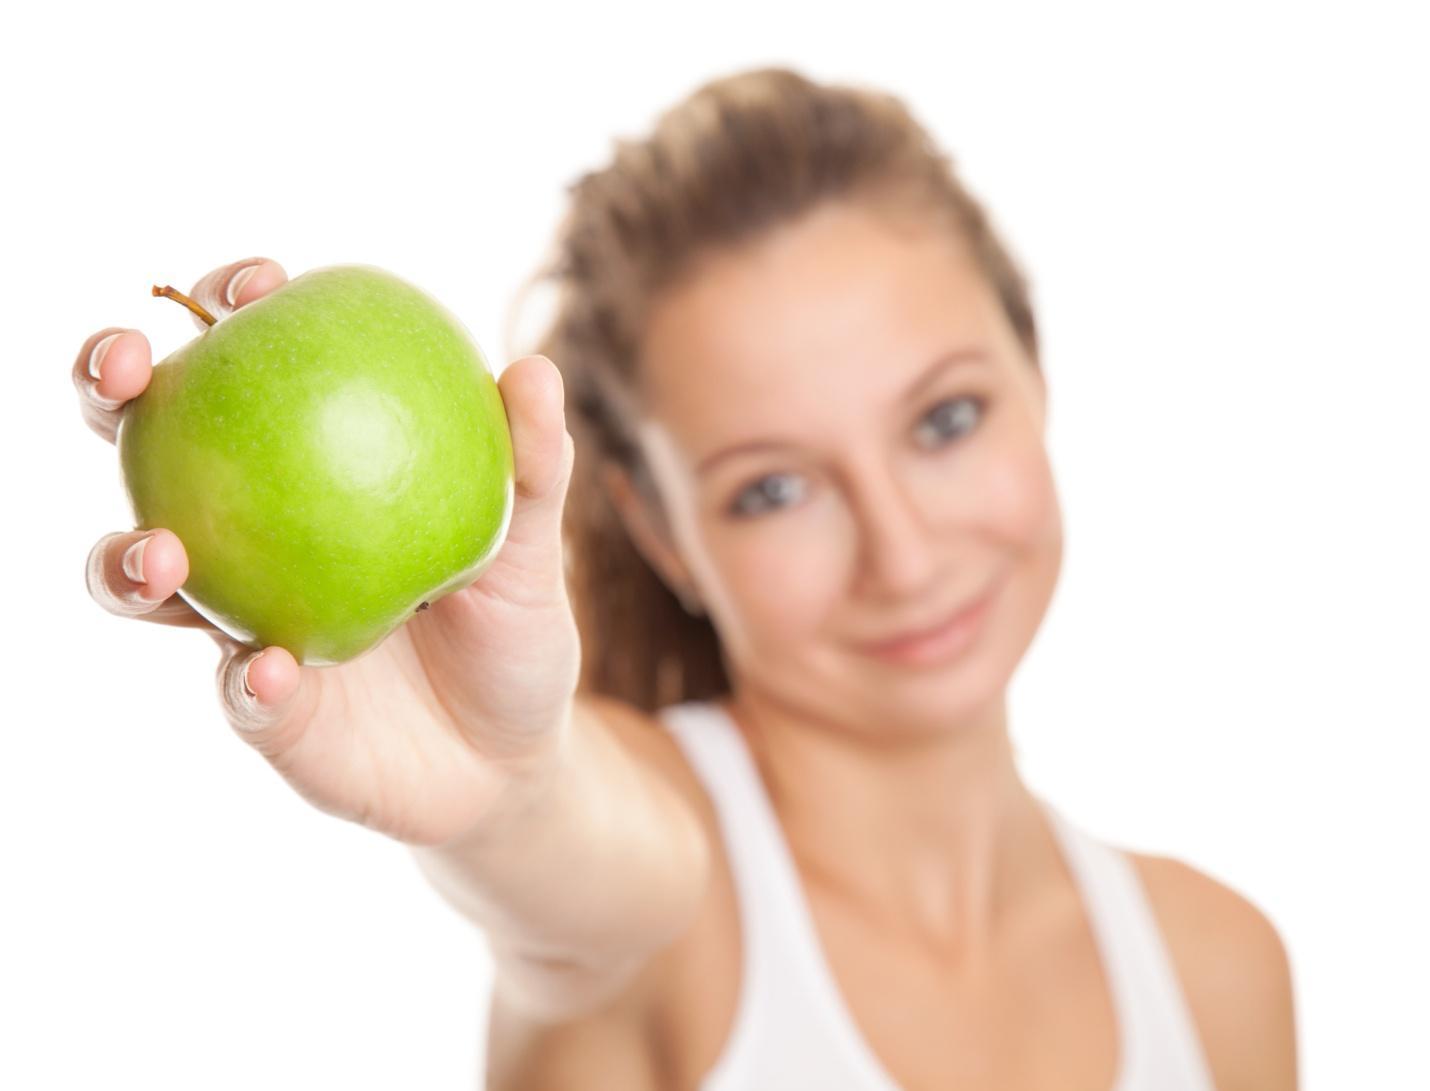 Best Healthy Food Blogs 2020 Blog :: 2020 Meals Tips :: Top 5 Healthy High Fiber Foods That